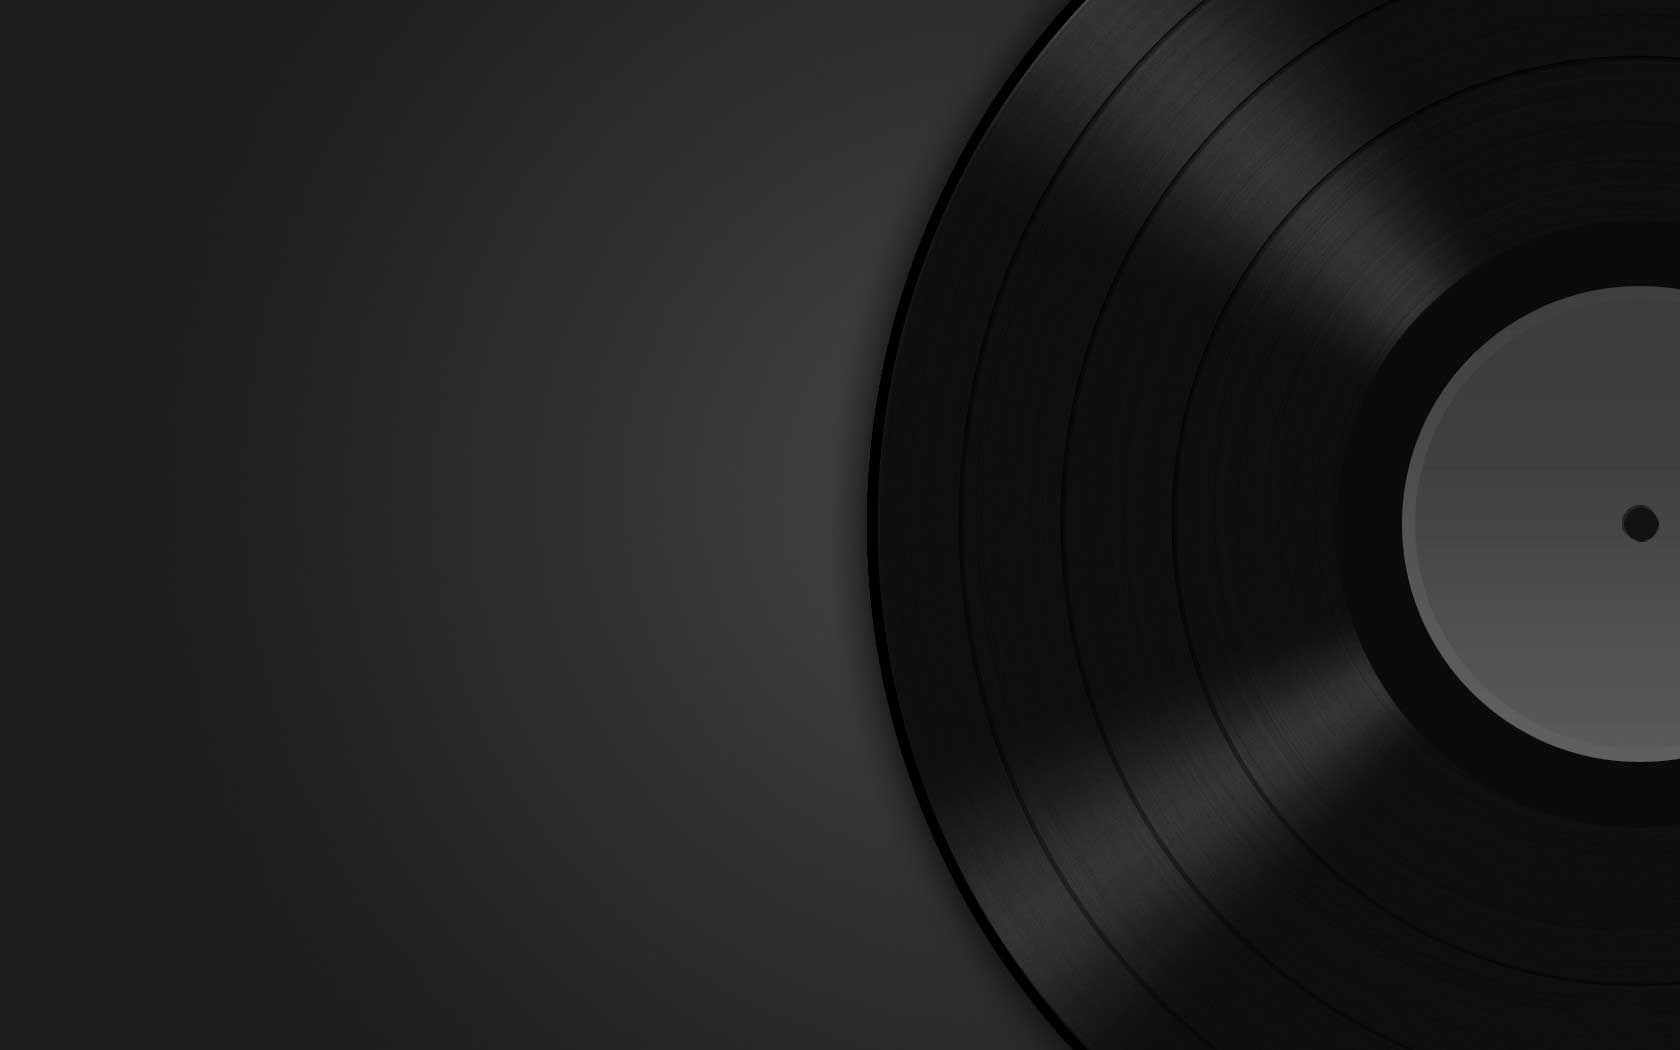 Https Soundcloud Com Abizzle 1 My Soundcloud You Ll Find Most Of My Dj Mixes N Stuff There